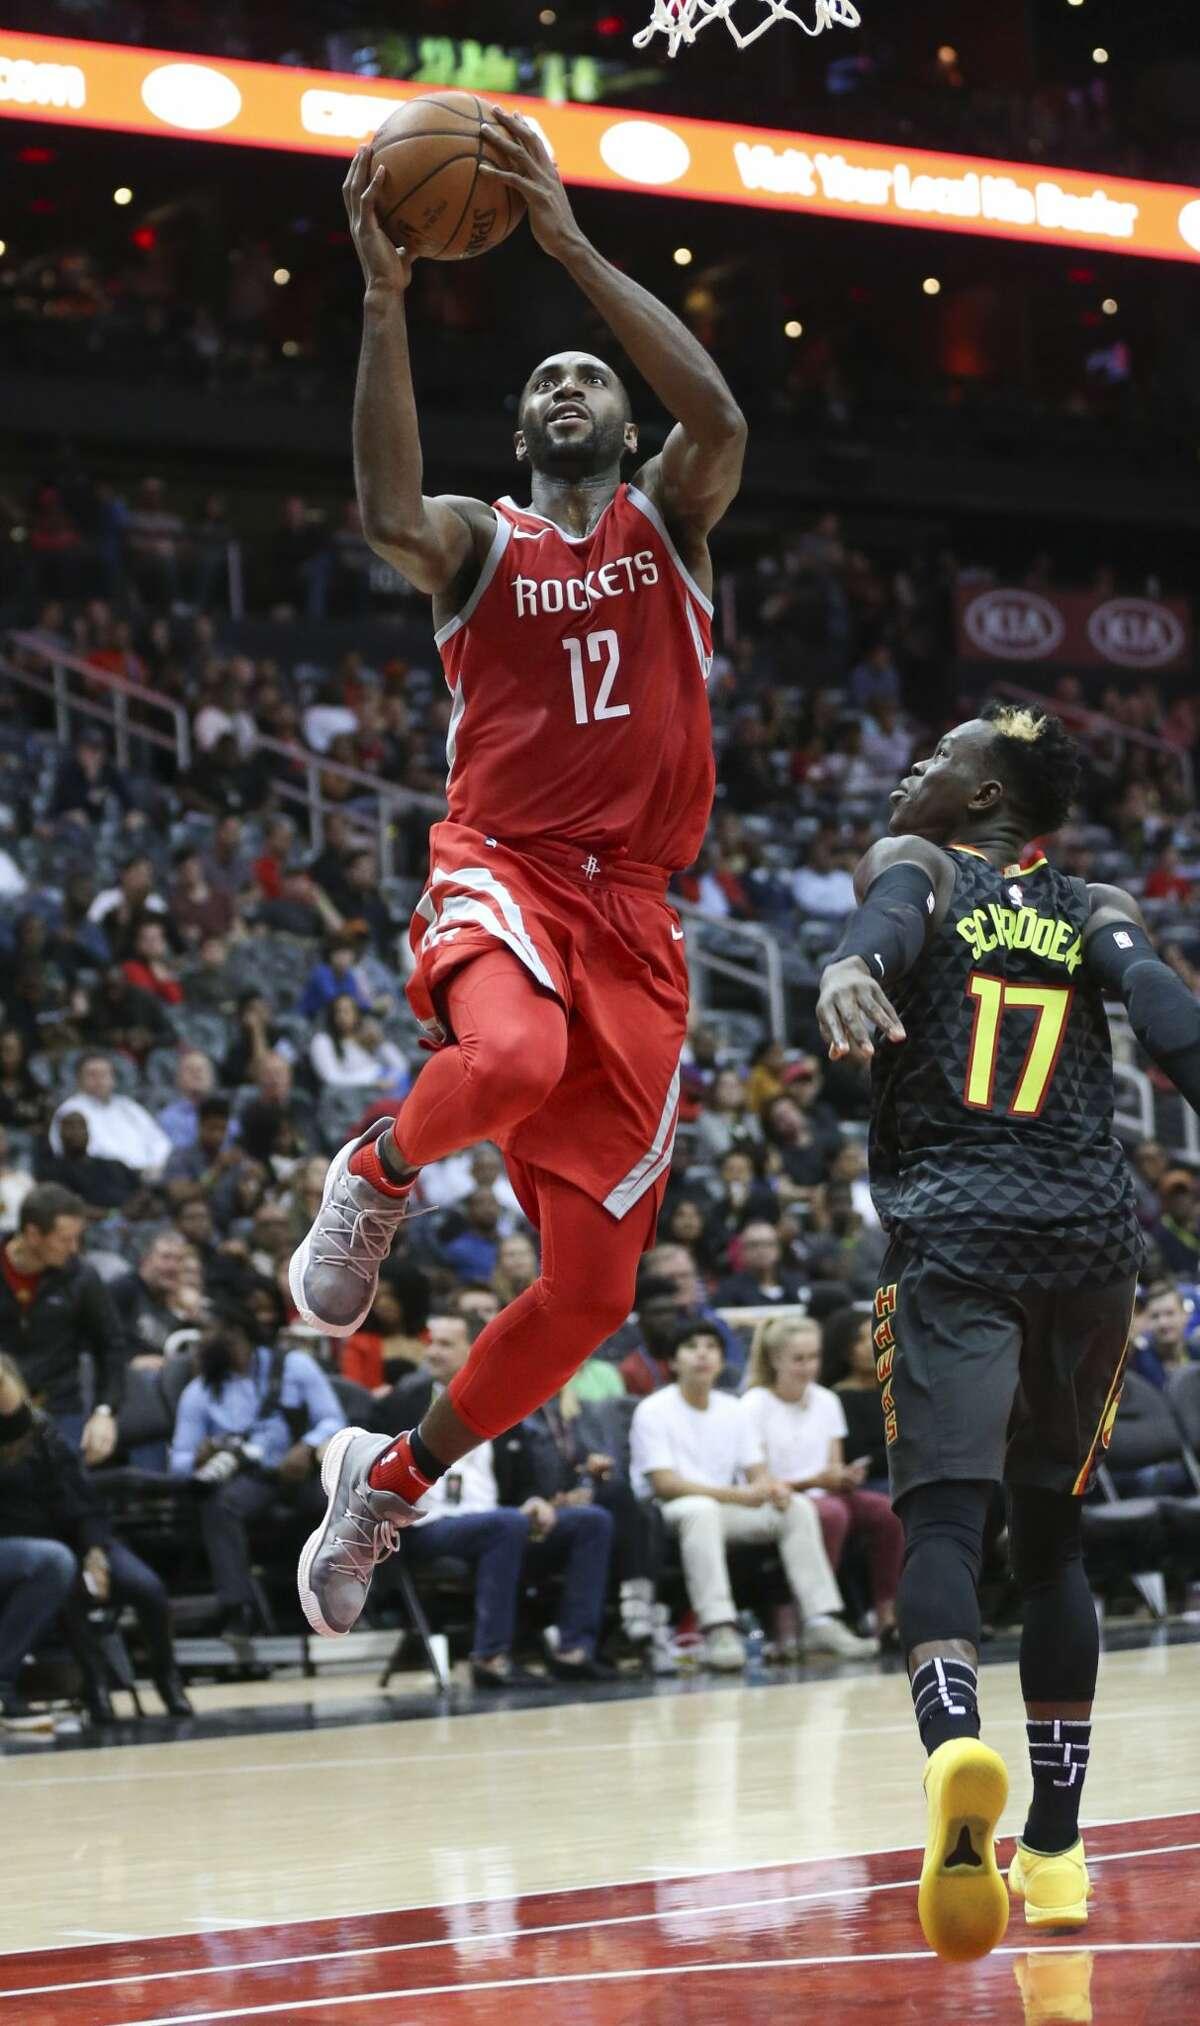 Houston Rockets forward Luc Mbah a Moute (12) drives against Atlanta Hawks guard Dennis Schroder (17) in the second half of an NBA basketball game Friday, Nov. 3, 2017, in Atlanta. (AP Photo/John Bazemore)